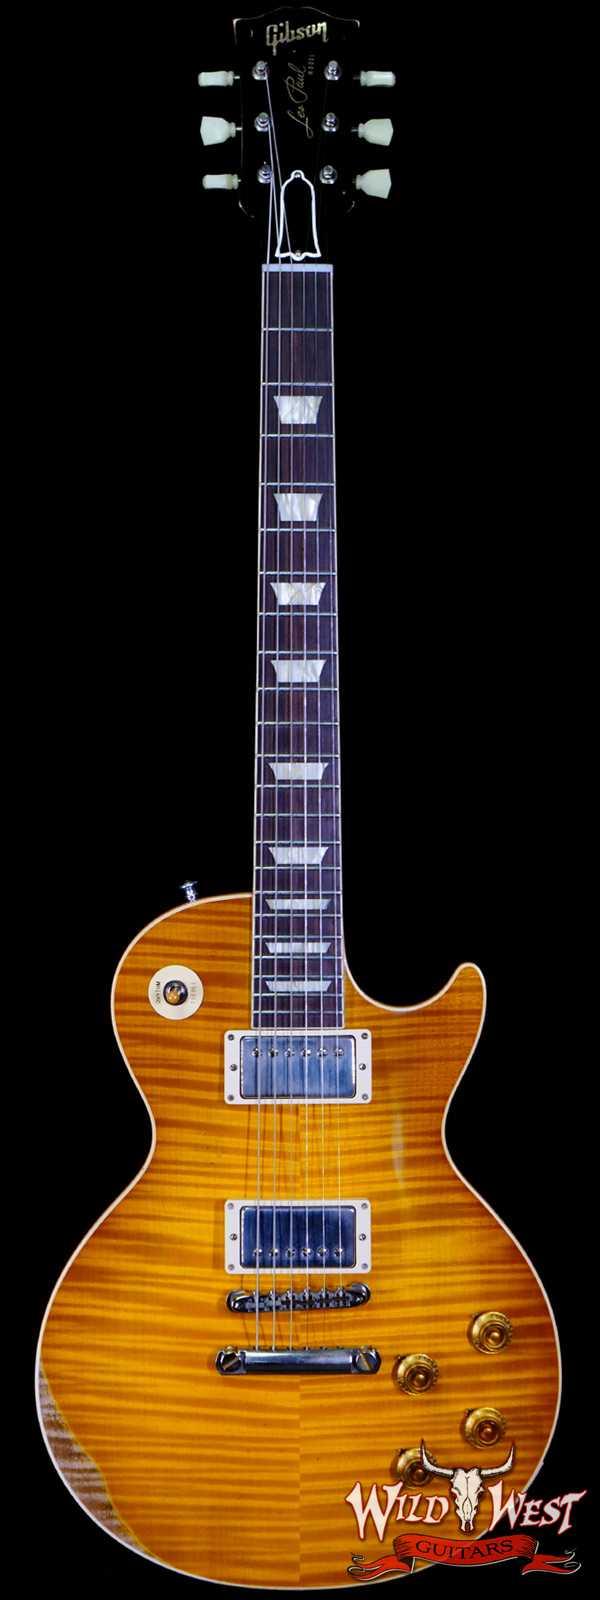 Gibson Custom Shop M2M Hand Selected Kill Top 60th Anniversary 1959 Les Paul Standard Heavy Aged DirtyLemon Fade 8.40 lbs